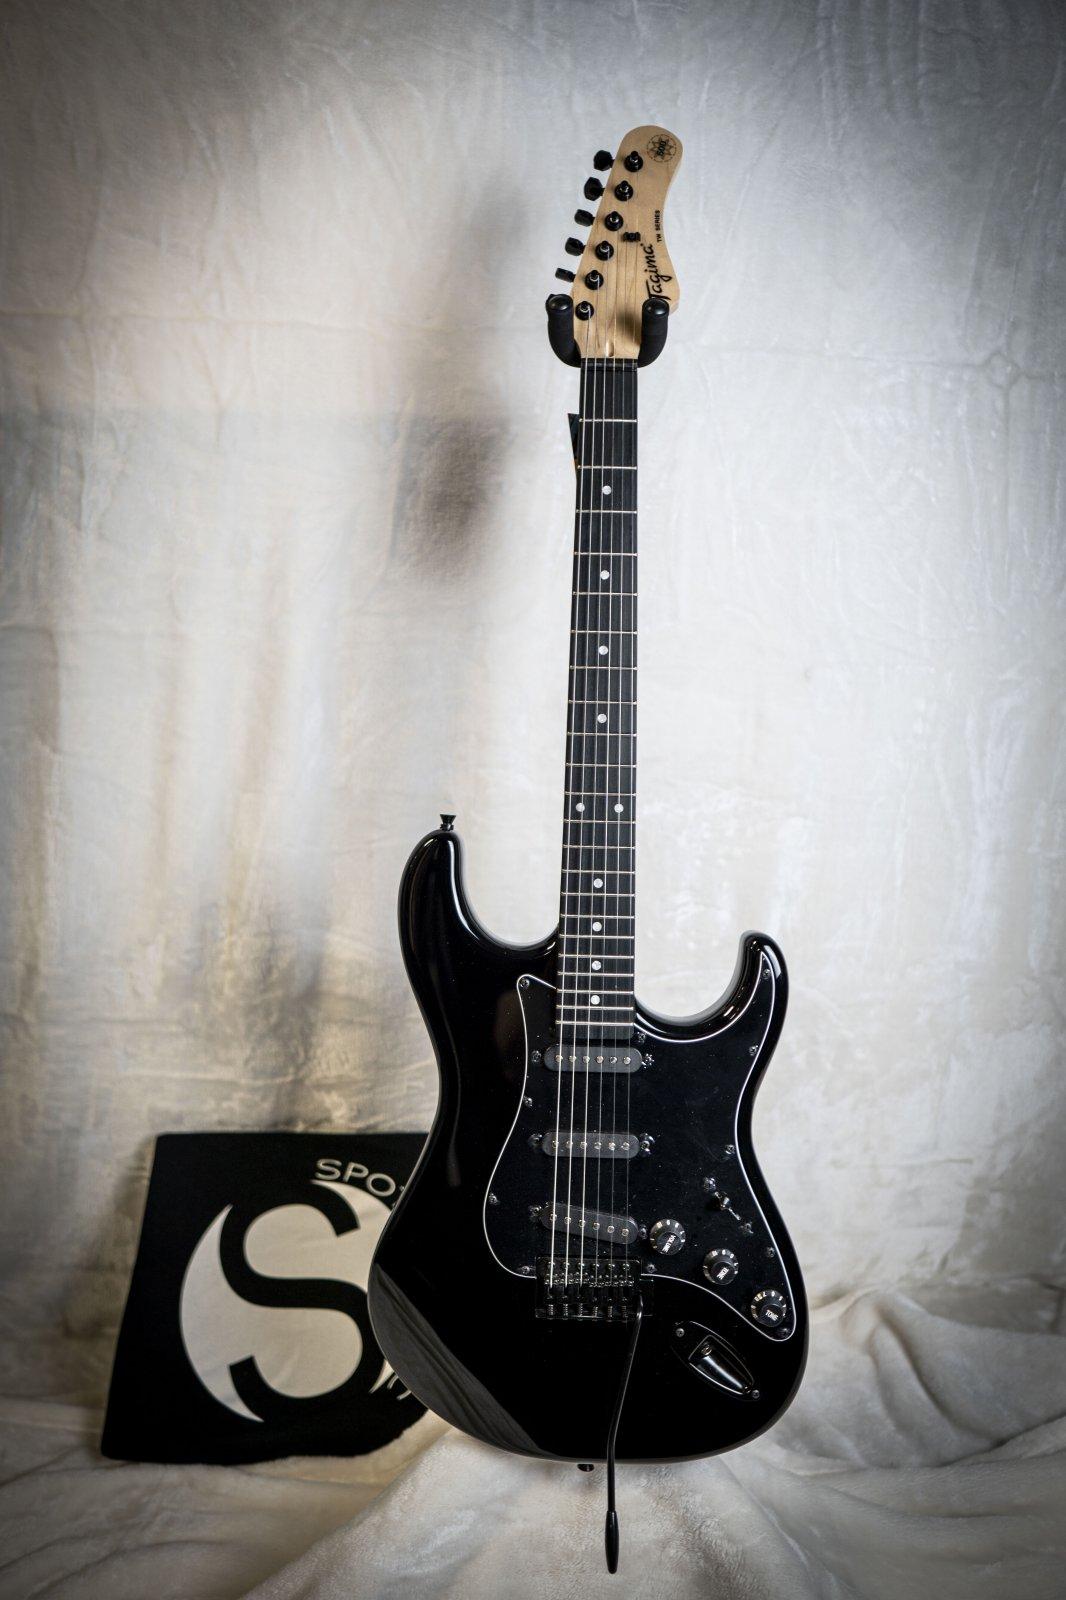 Tagima TG-500-BK-DF/BK Blacked Out Electric Guitar